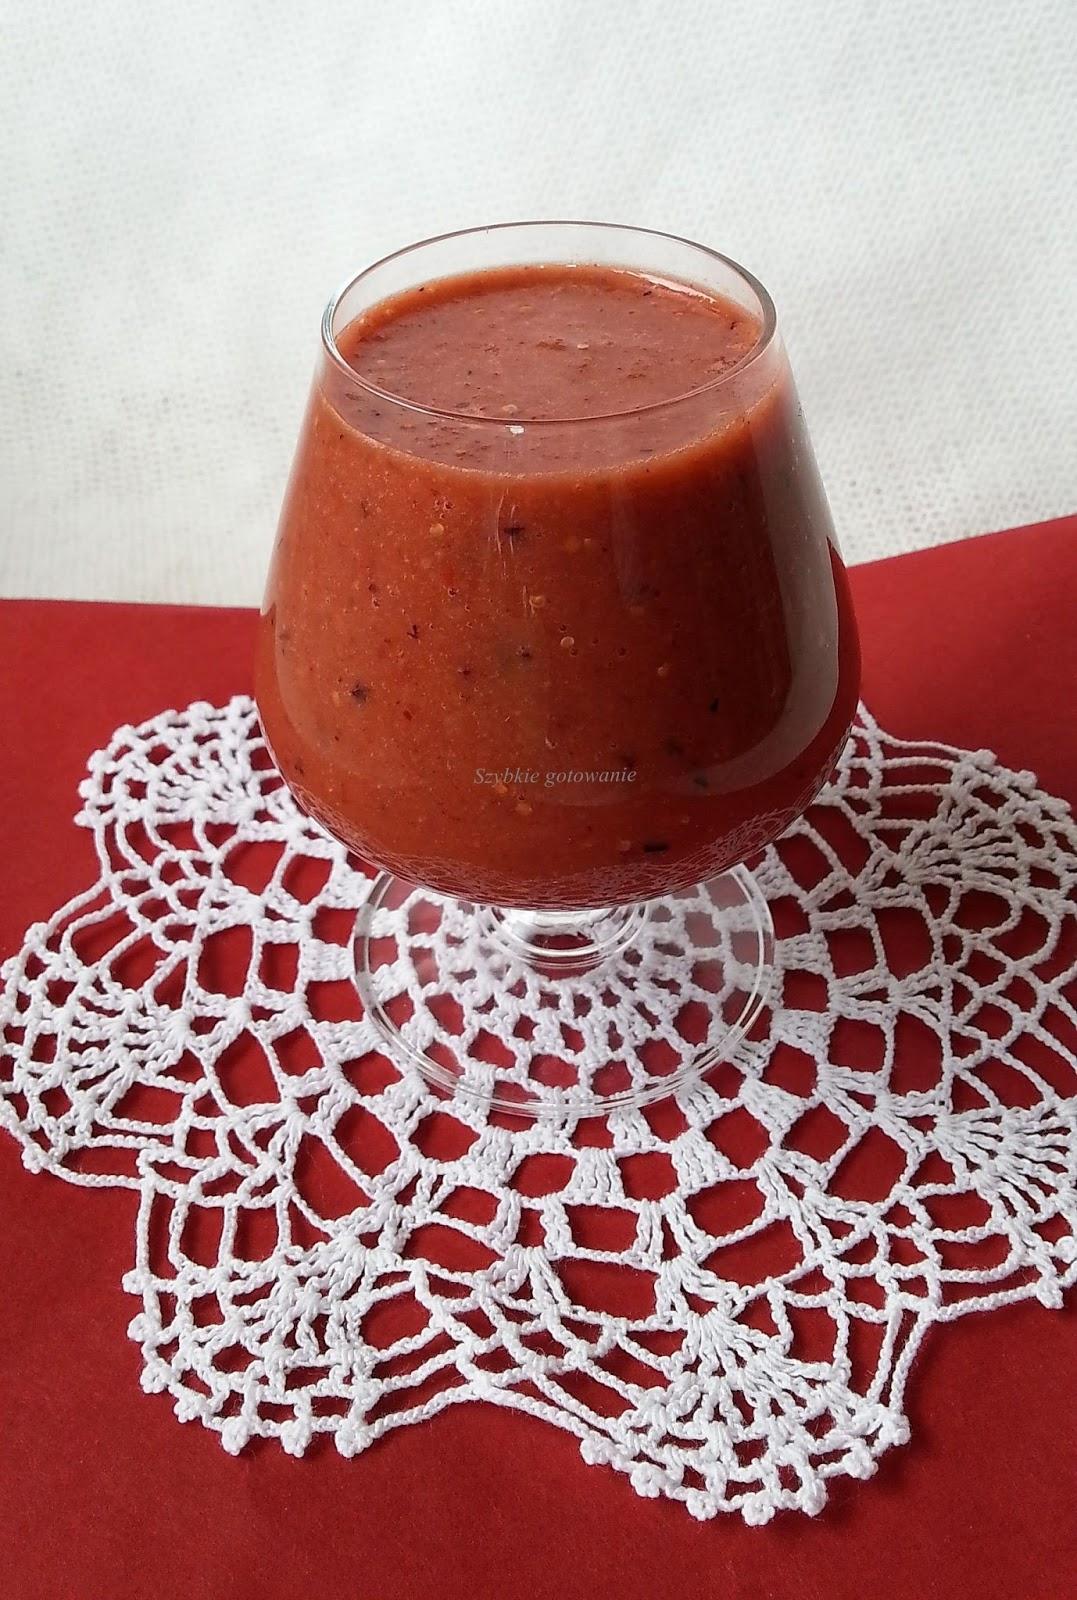 Zdrowy koktajl z jagodami goji i otrębami